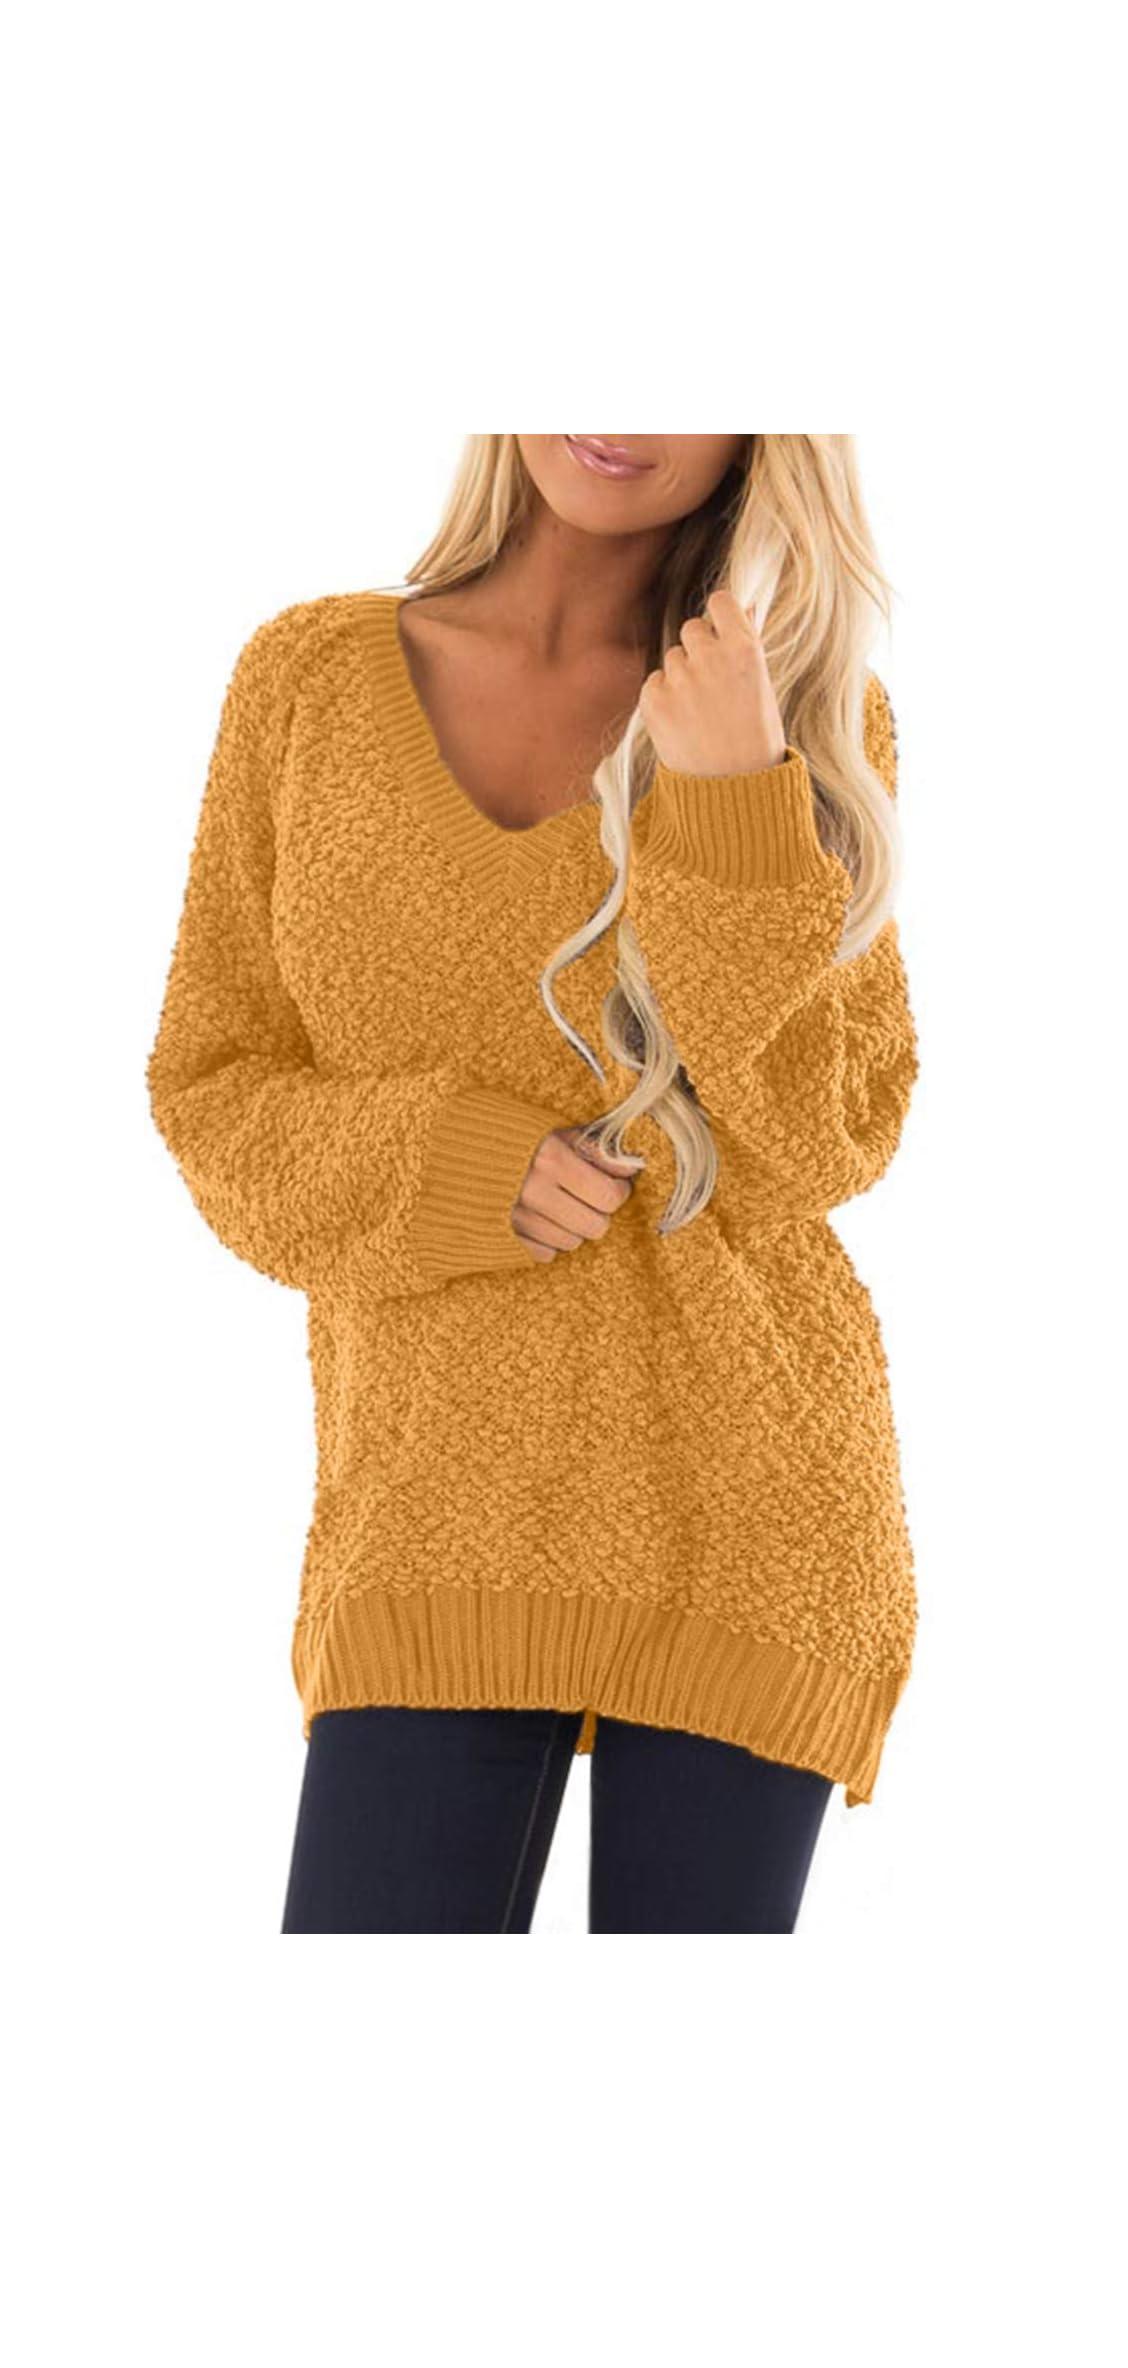 Women's Oversized V Neck Fuzzy Sherpa Fleece Pullover